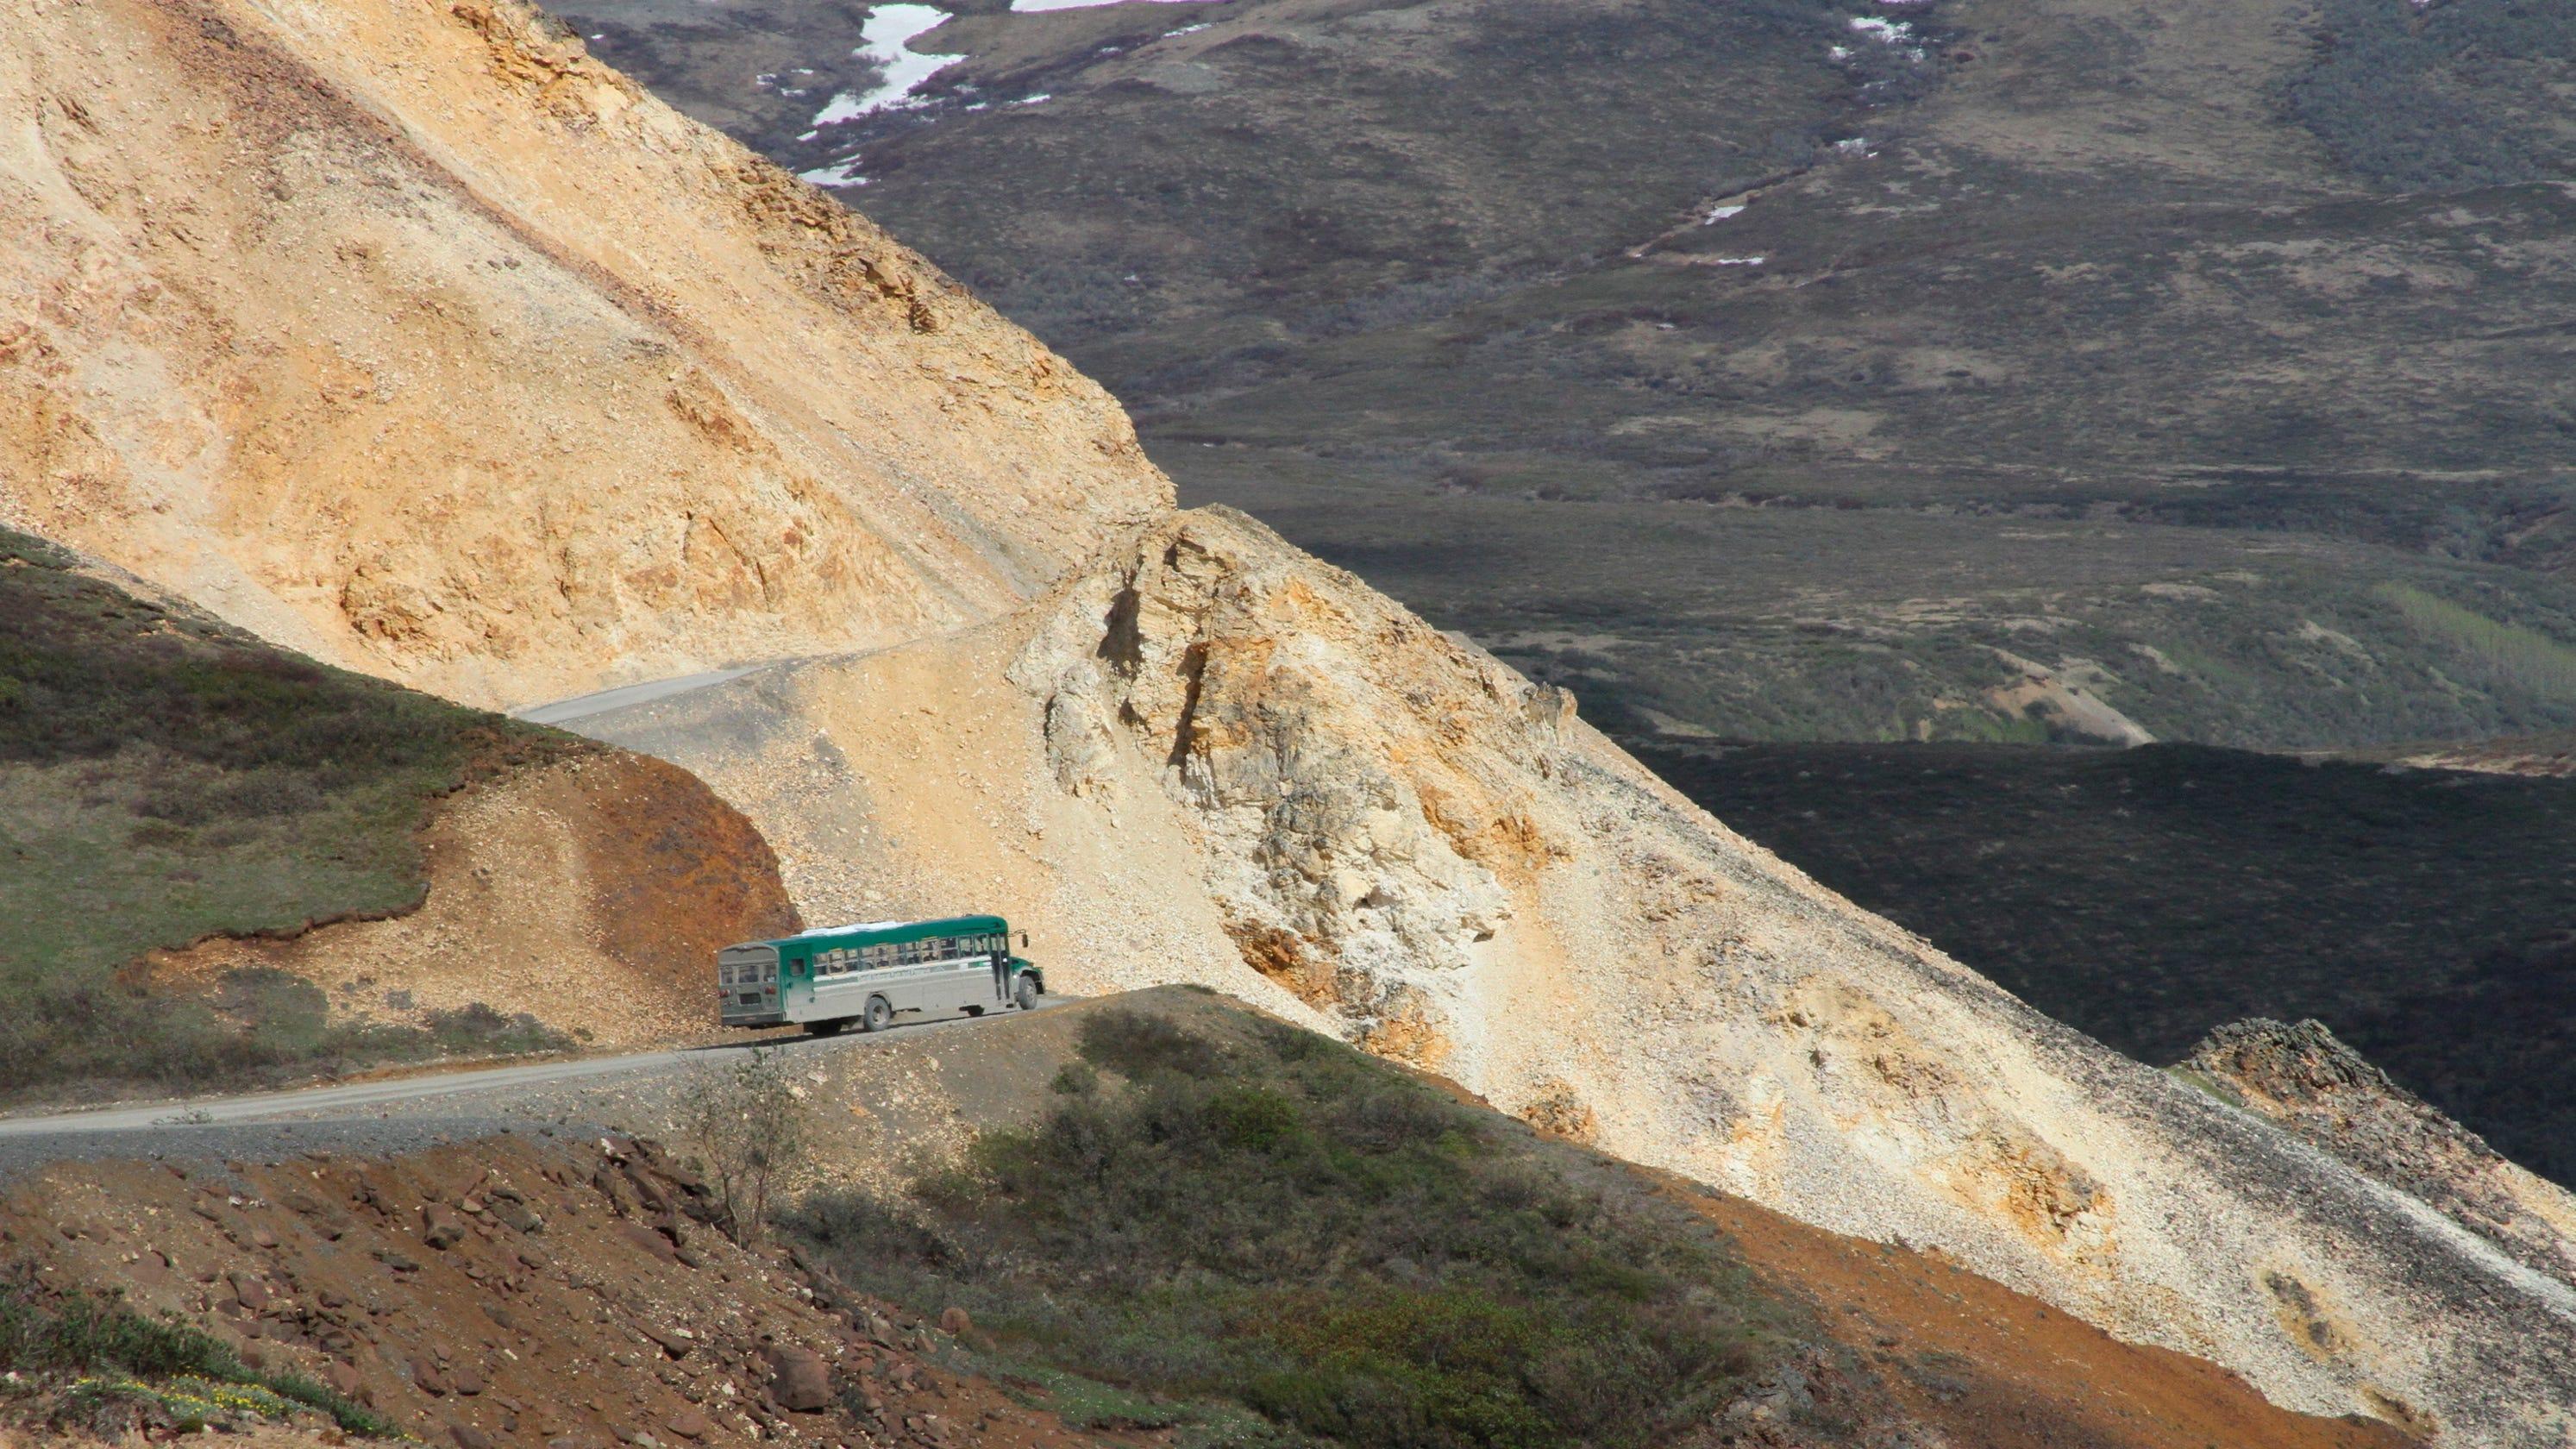 Hundreds of stranded tourists returned to safety: Denali National Park road reopens